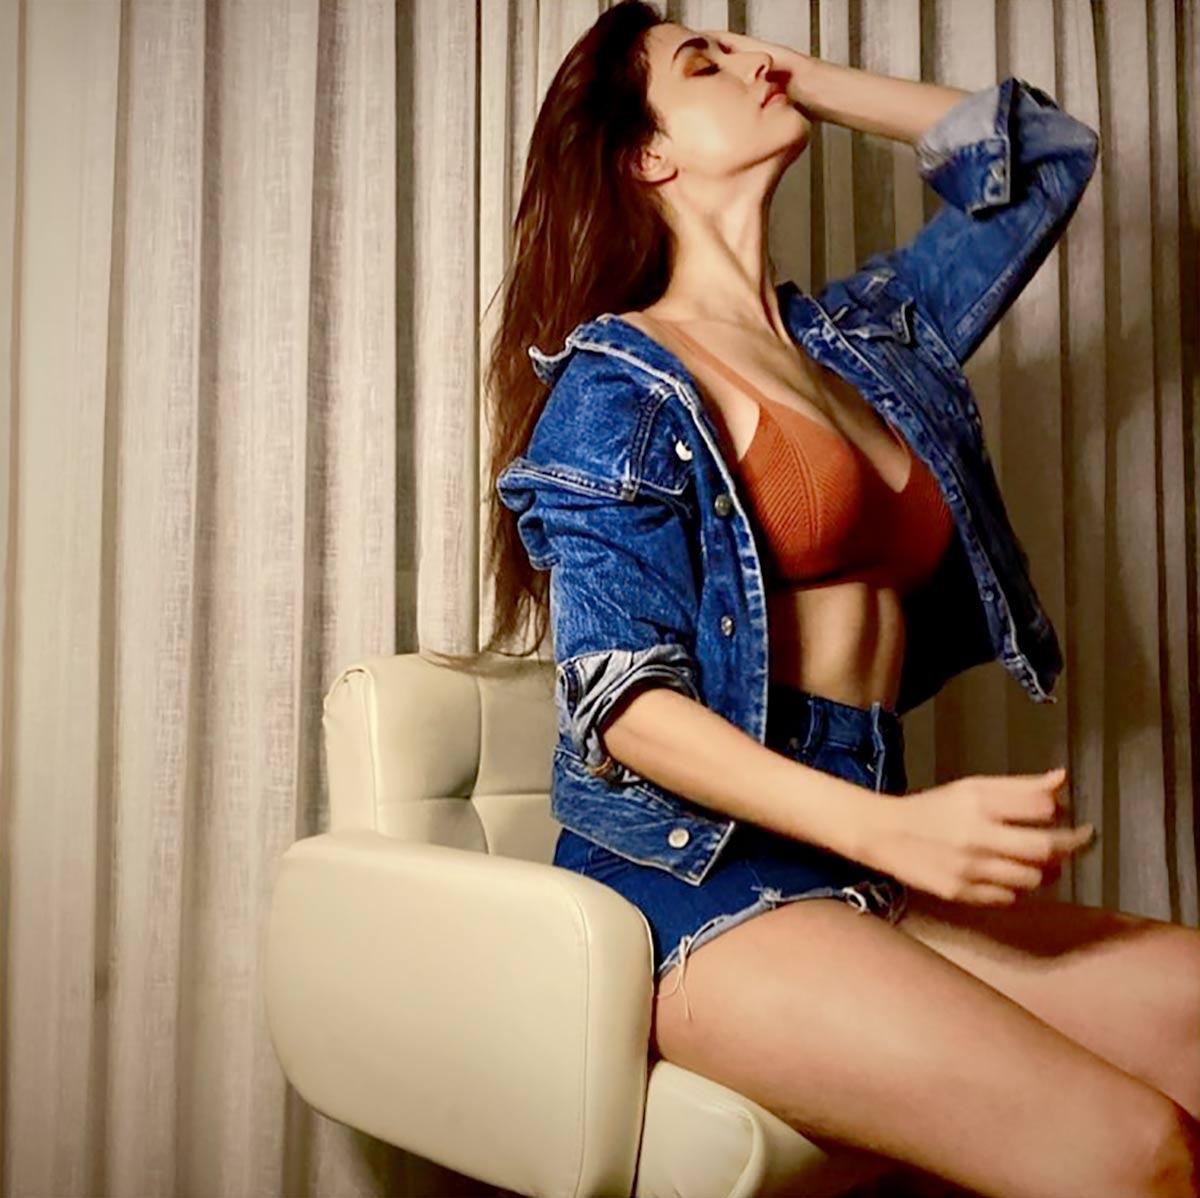 Kareena Kapoor starts shooting again